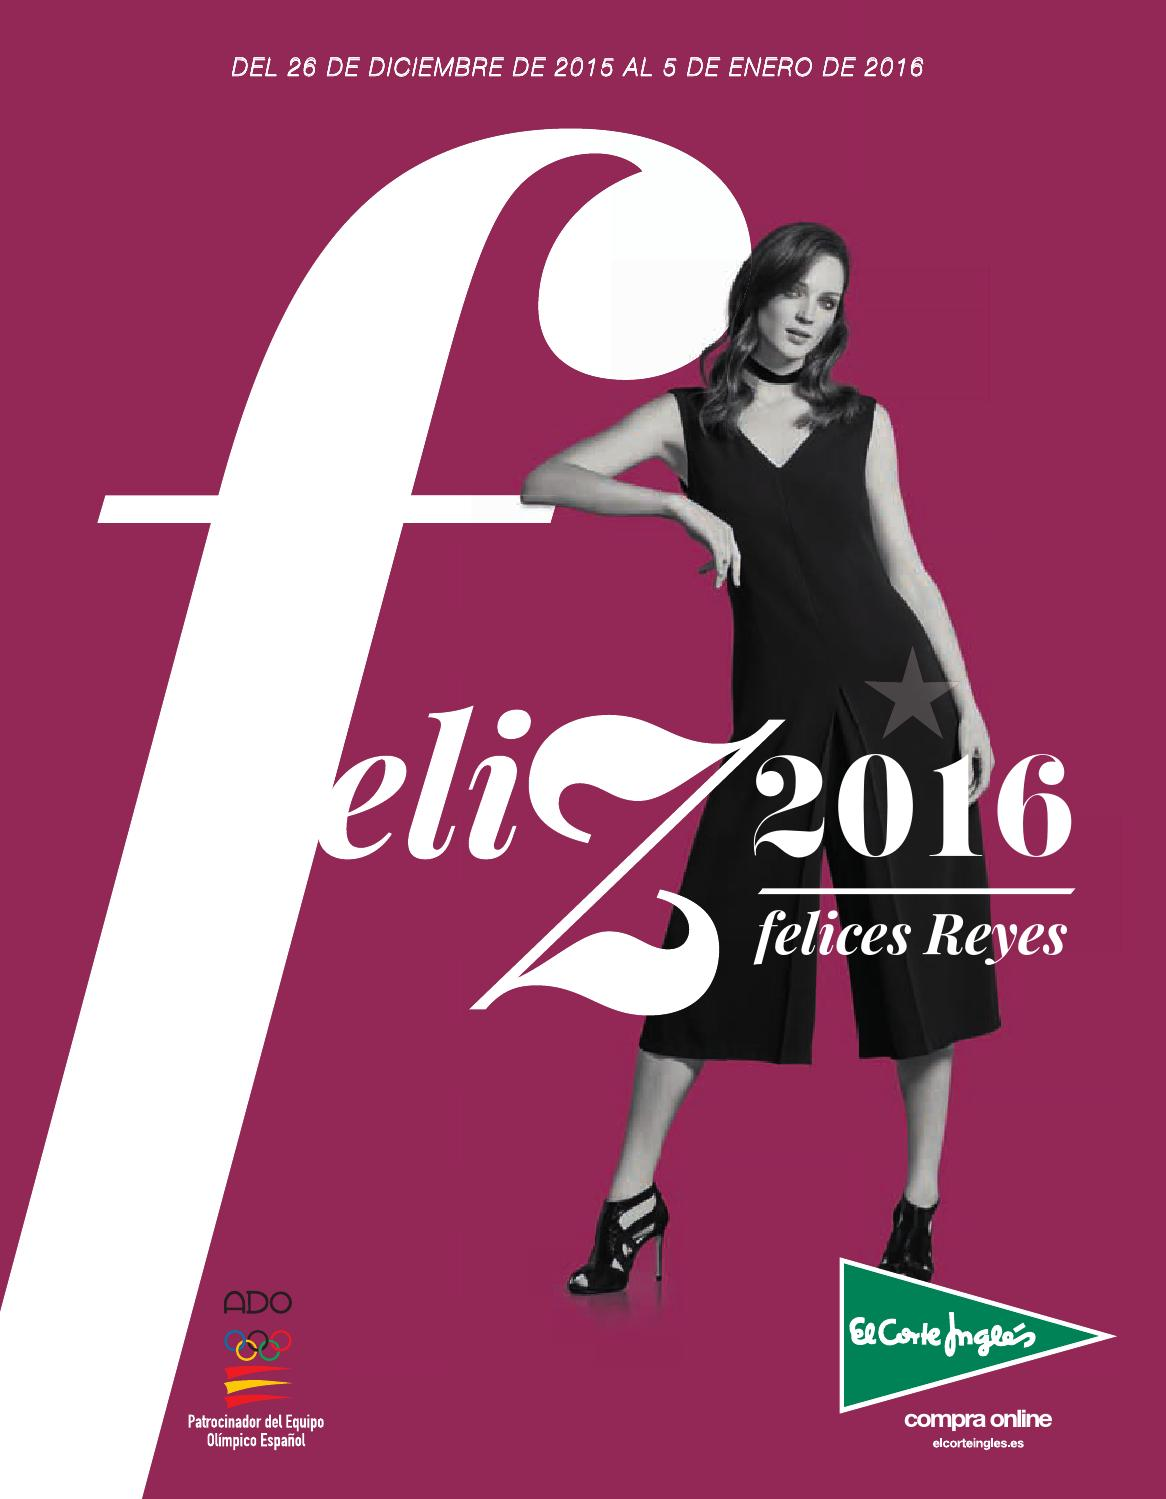 El Corte Inglés Feliz 2016 by André Gonçalves - issuu